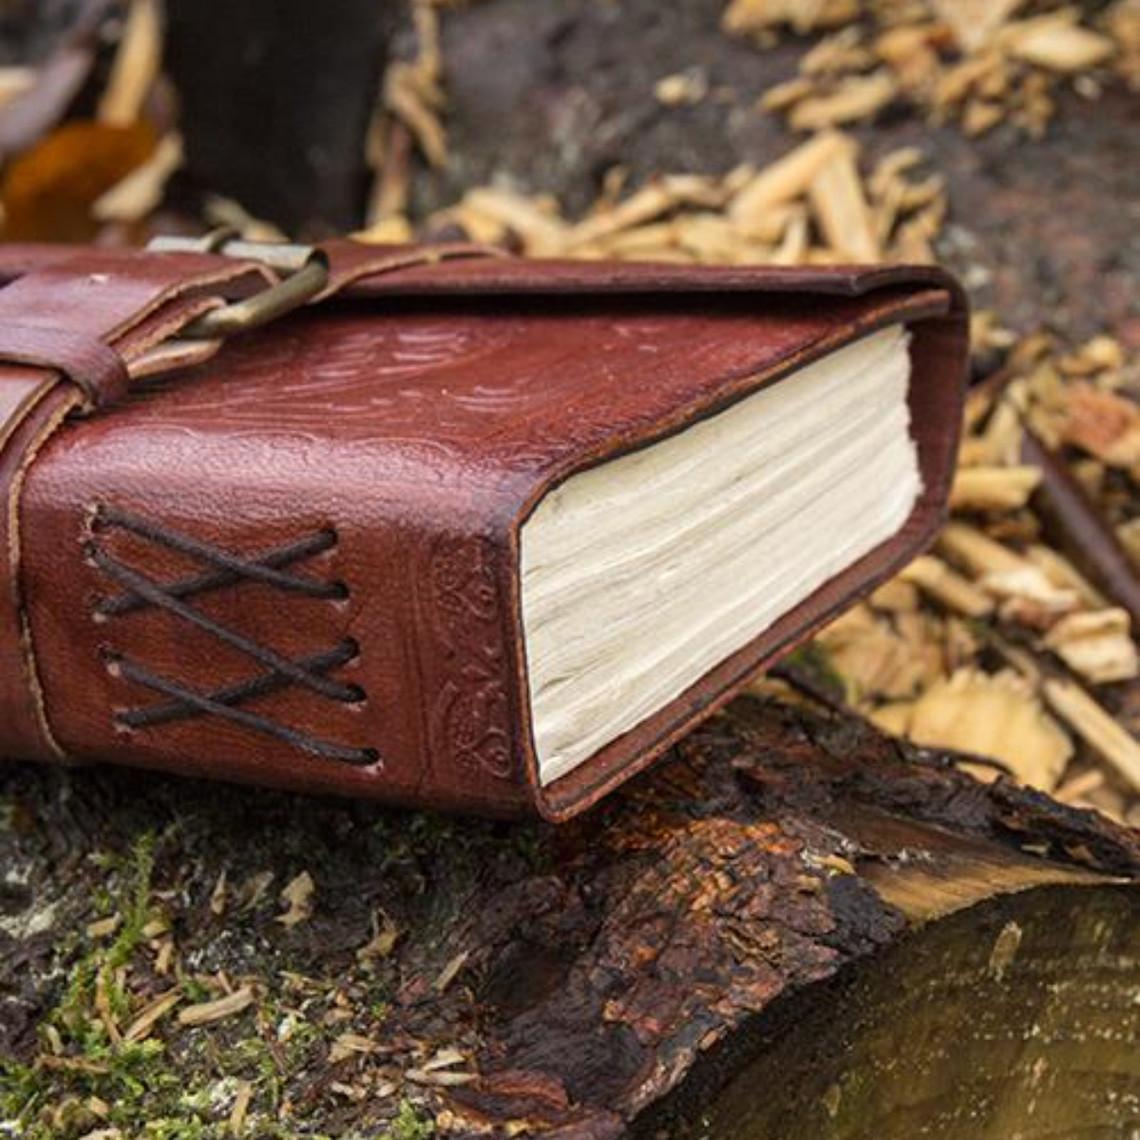 Epic Armoury Leren dagboek Burgos, klein